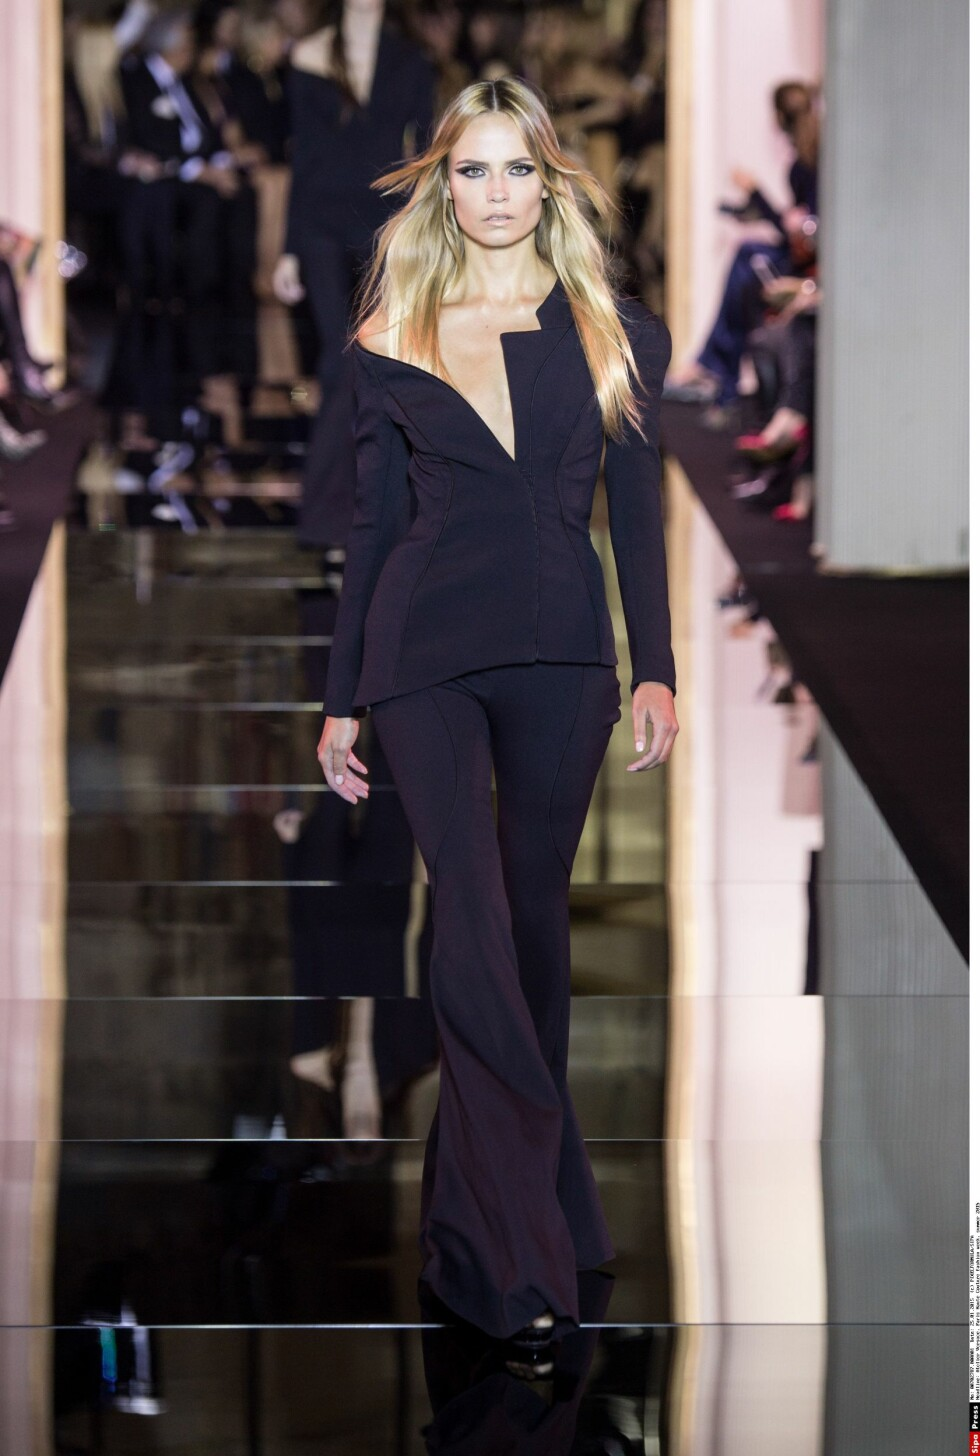 Atelier Versace Foto: PIXELFORMULA/SIPA/All Over Press